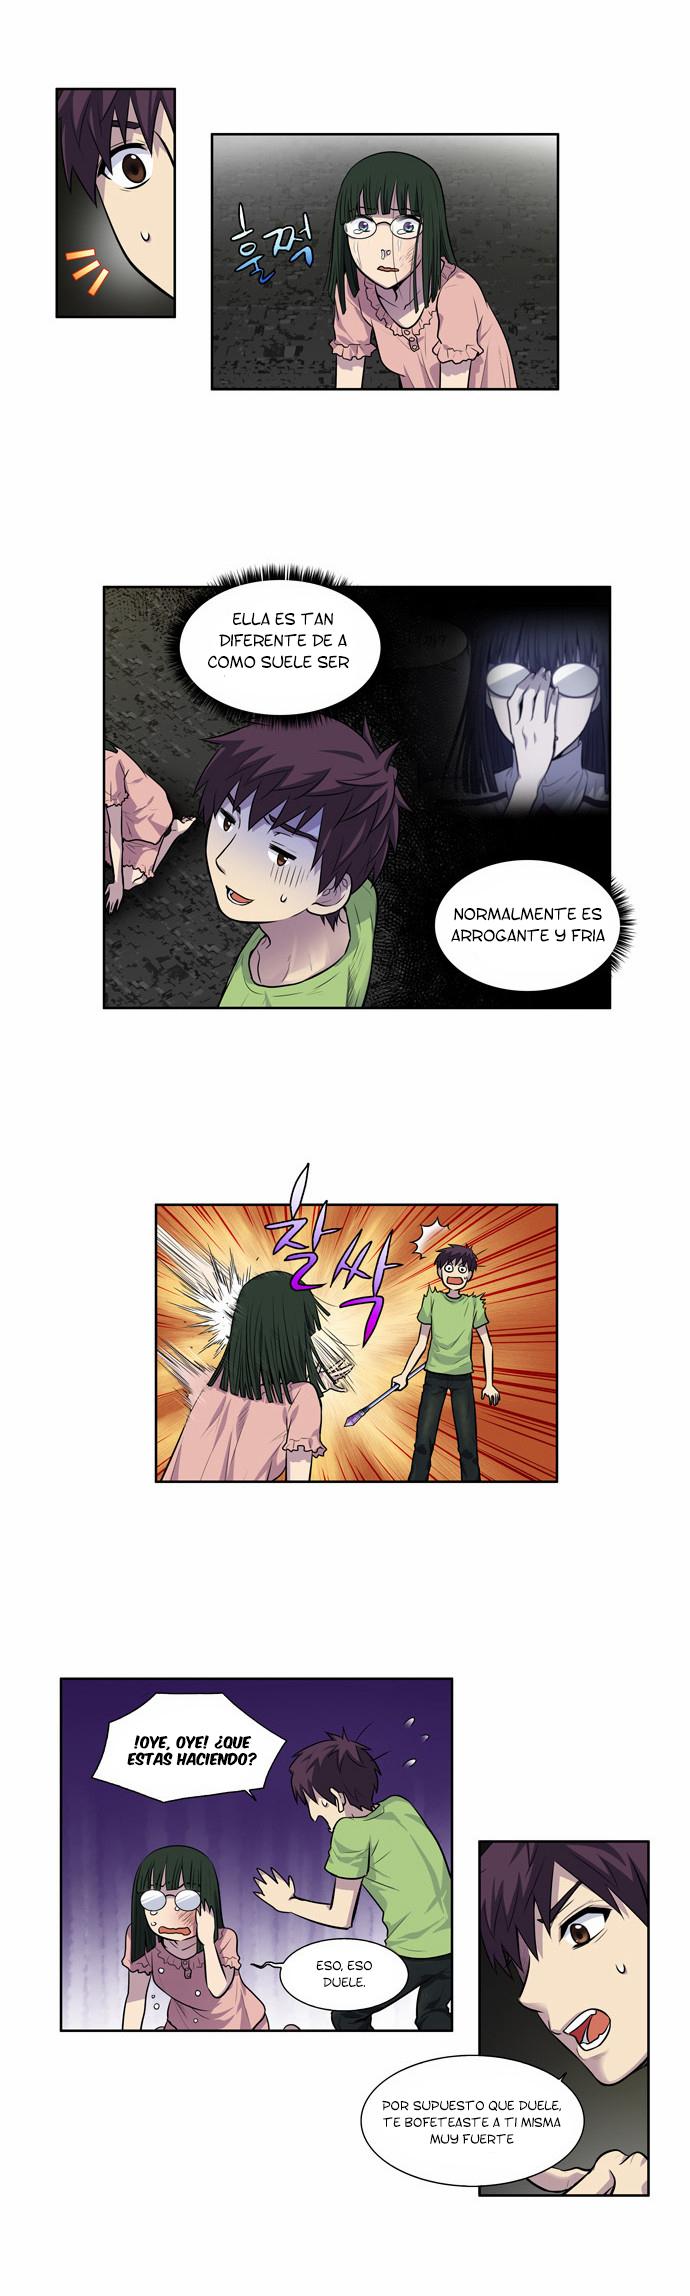 http://c5.ninemanga.com/es_manga/61/1725/420034/1e133156163737d12d15232b87874339.jpg Page 12